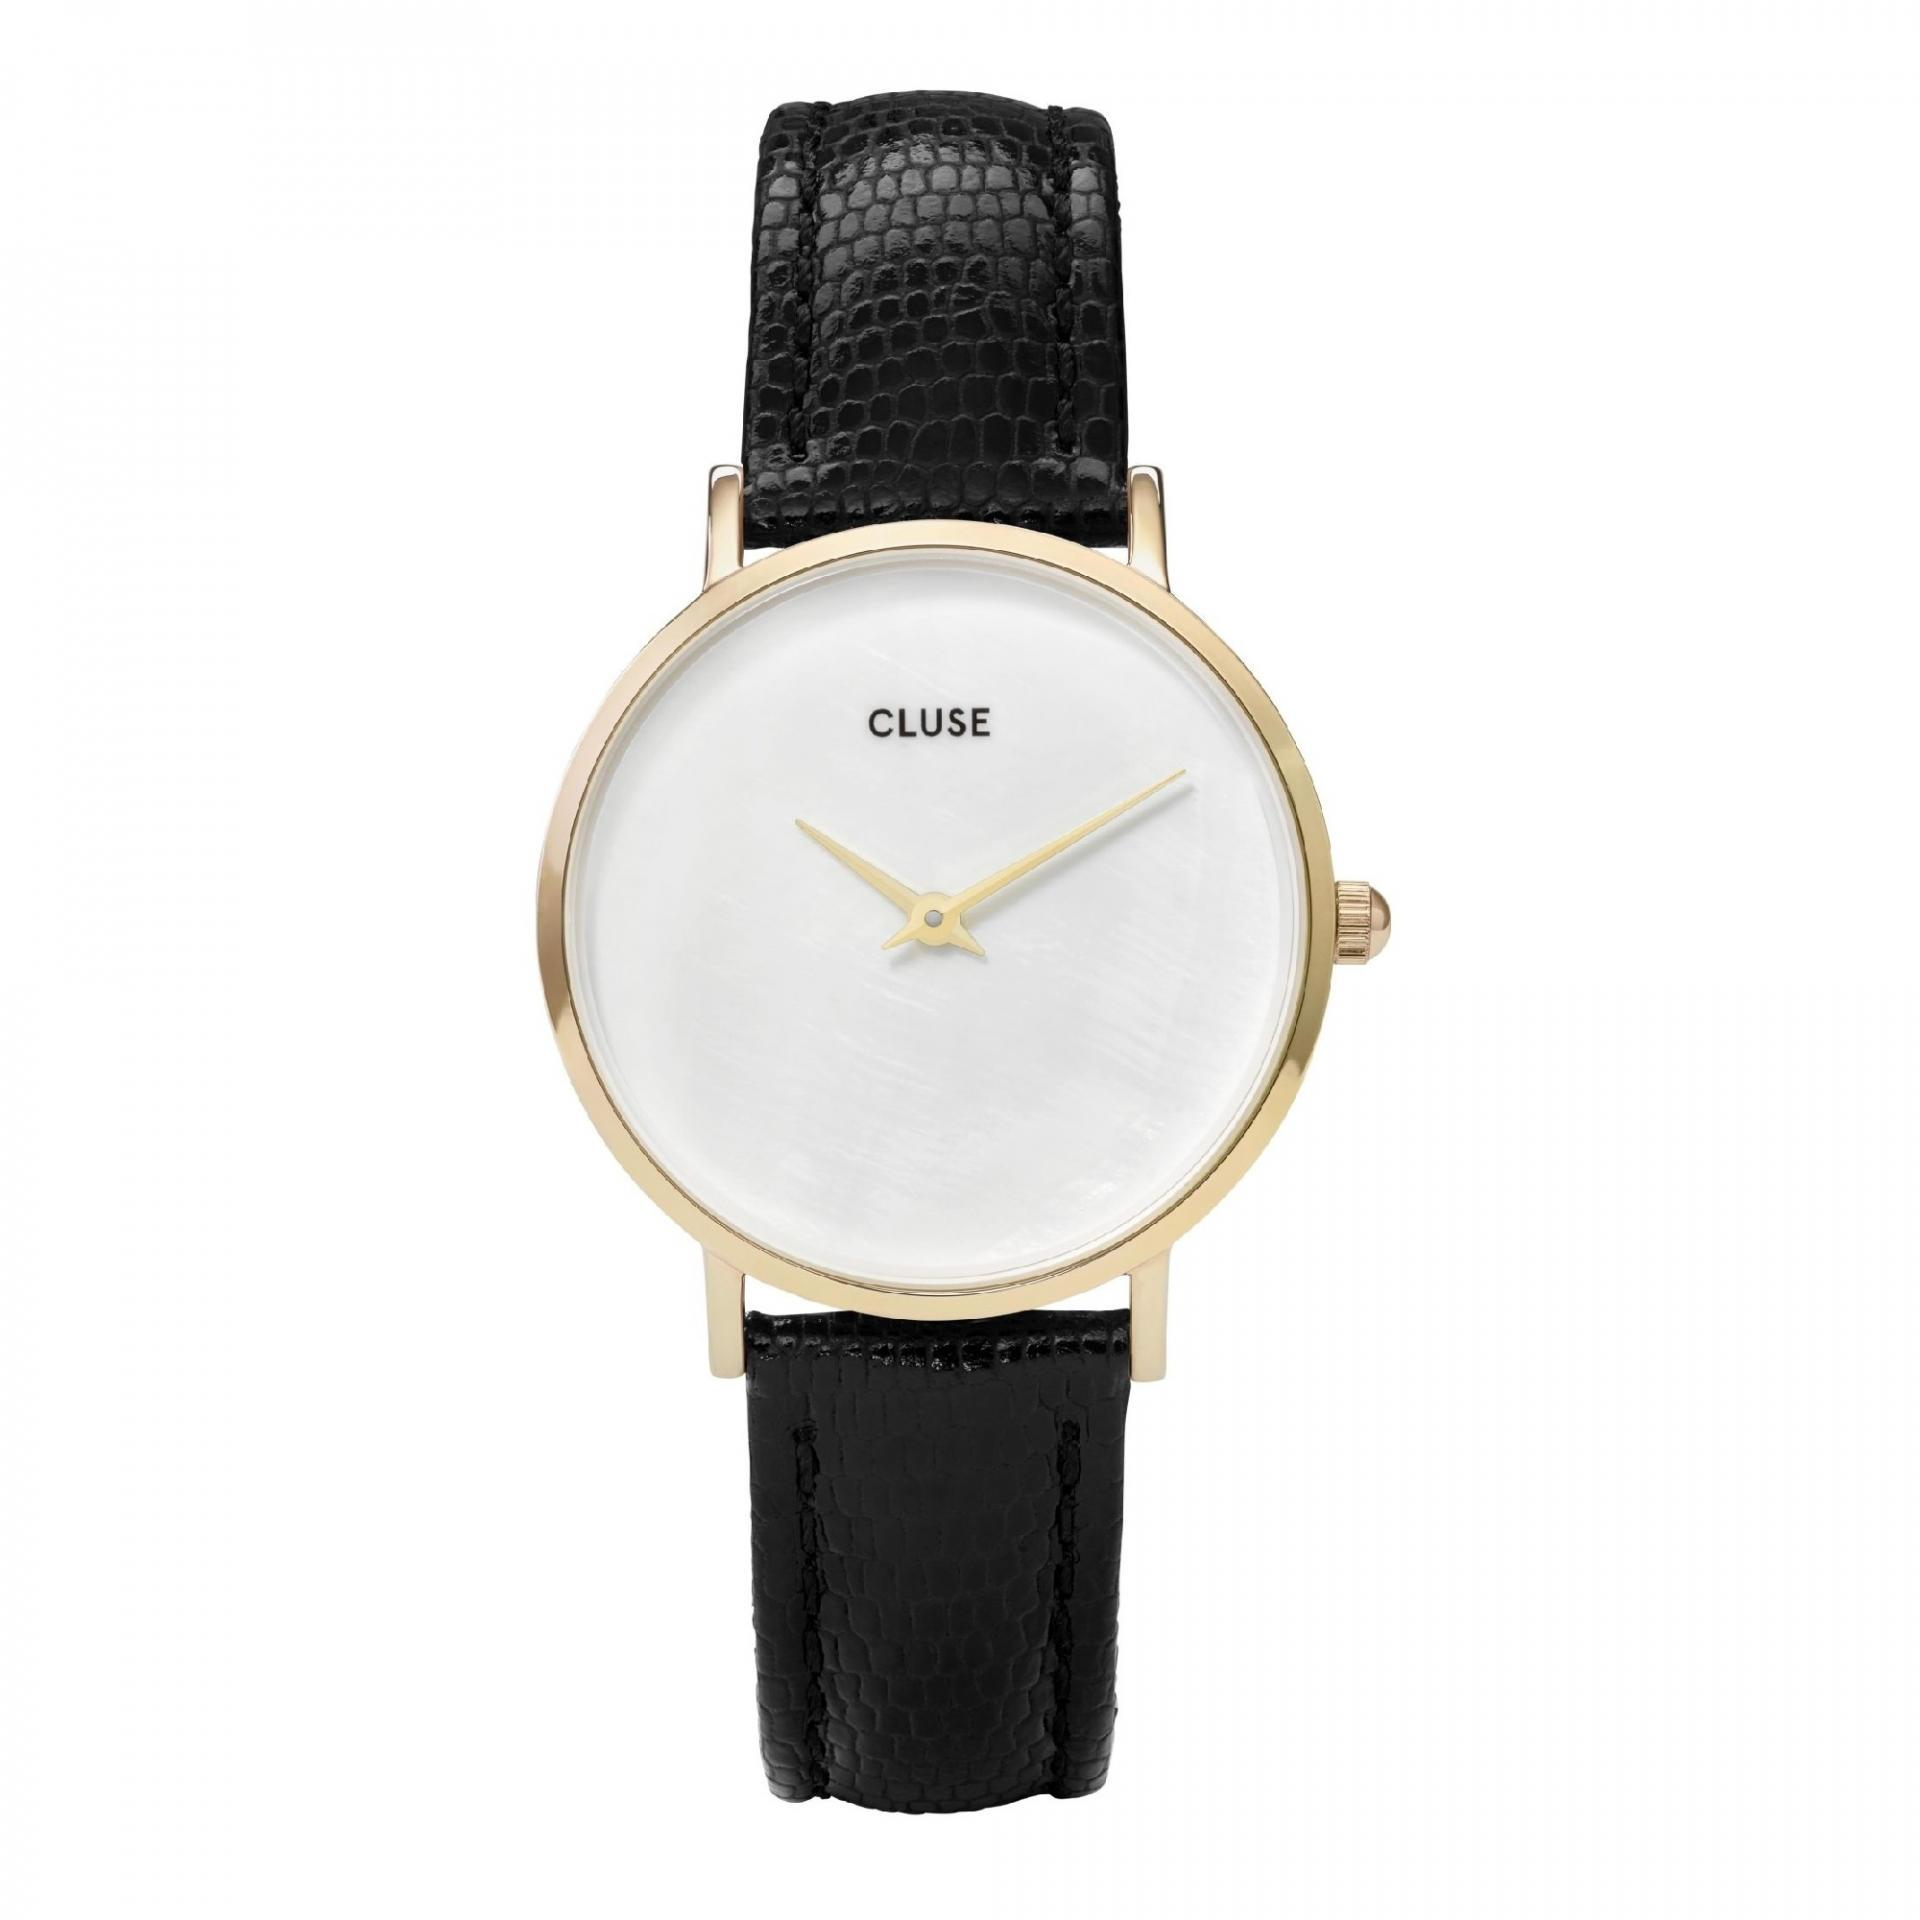 CLUSE Perleťové hodinky Cluse Minuit La Perle Gold White Pearl/Black Lizard, černá barva, bílá barva, zlatá barva, kov, kůže